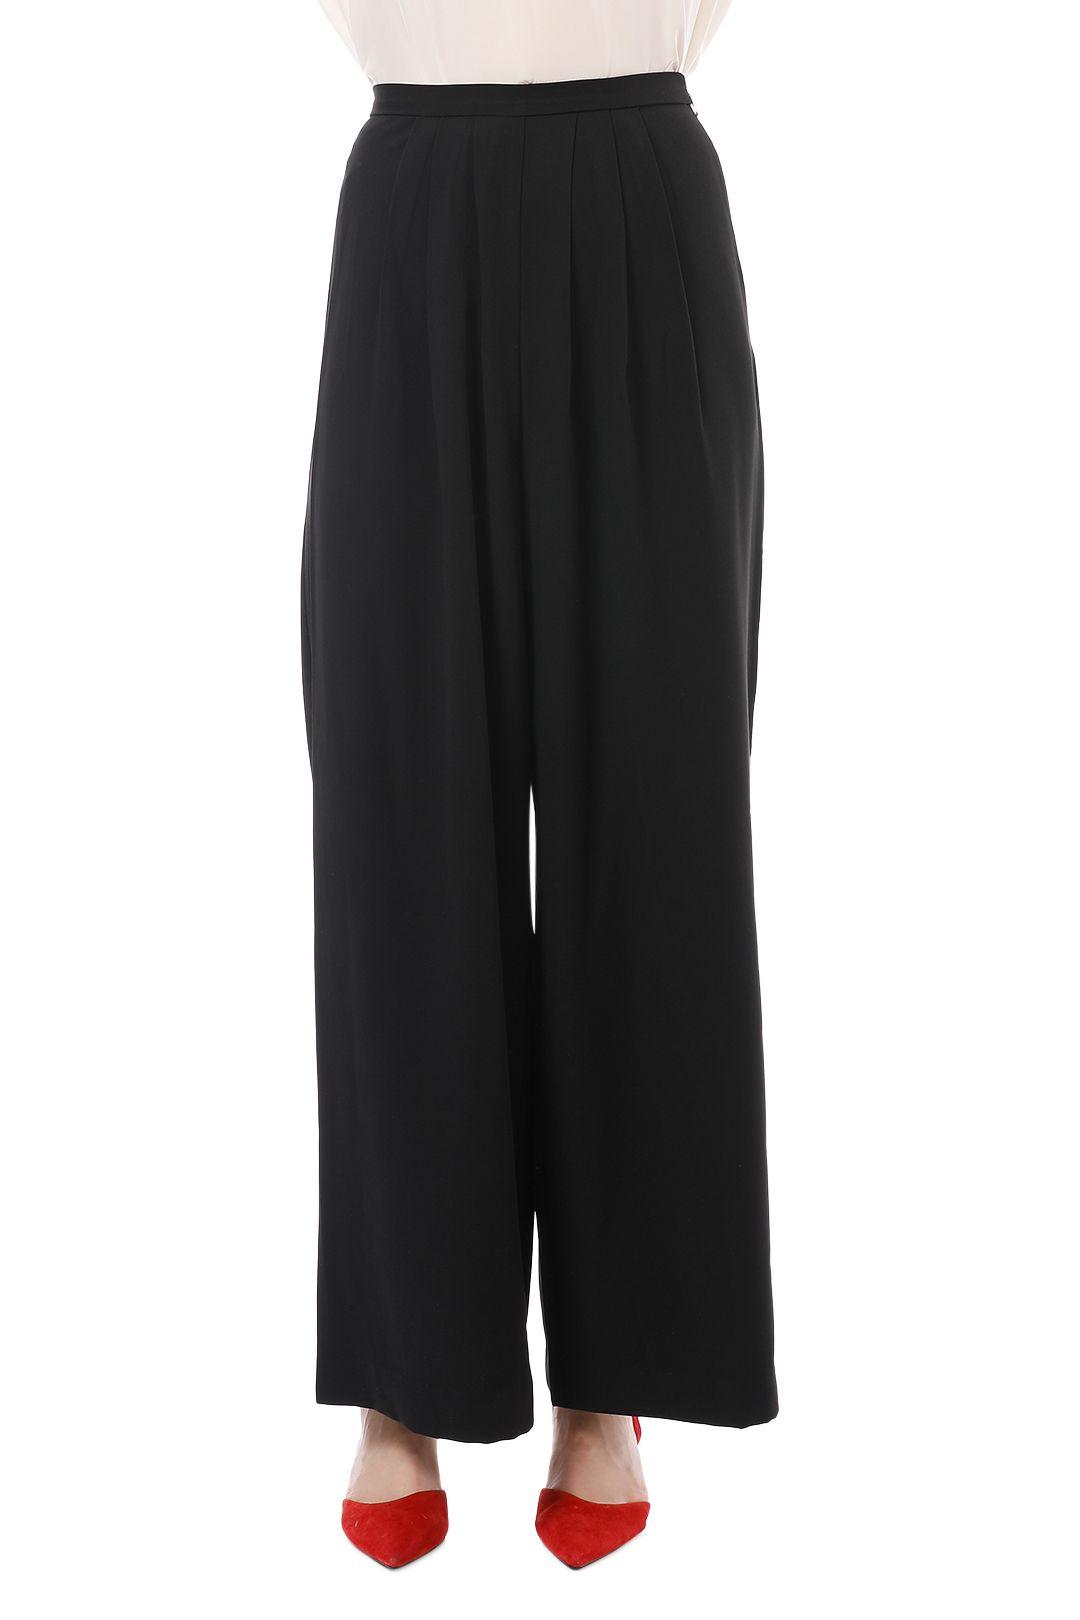 Friend of Audrey - Pleated Wide Leg Pants - Black - Crop